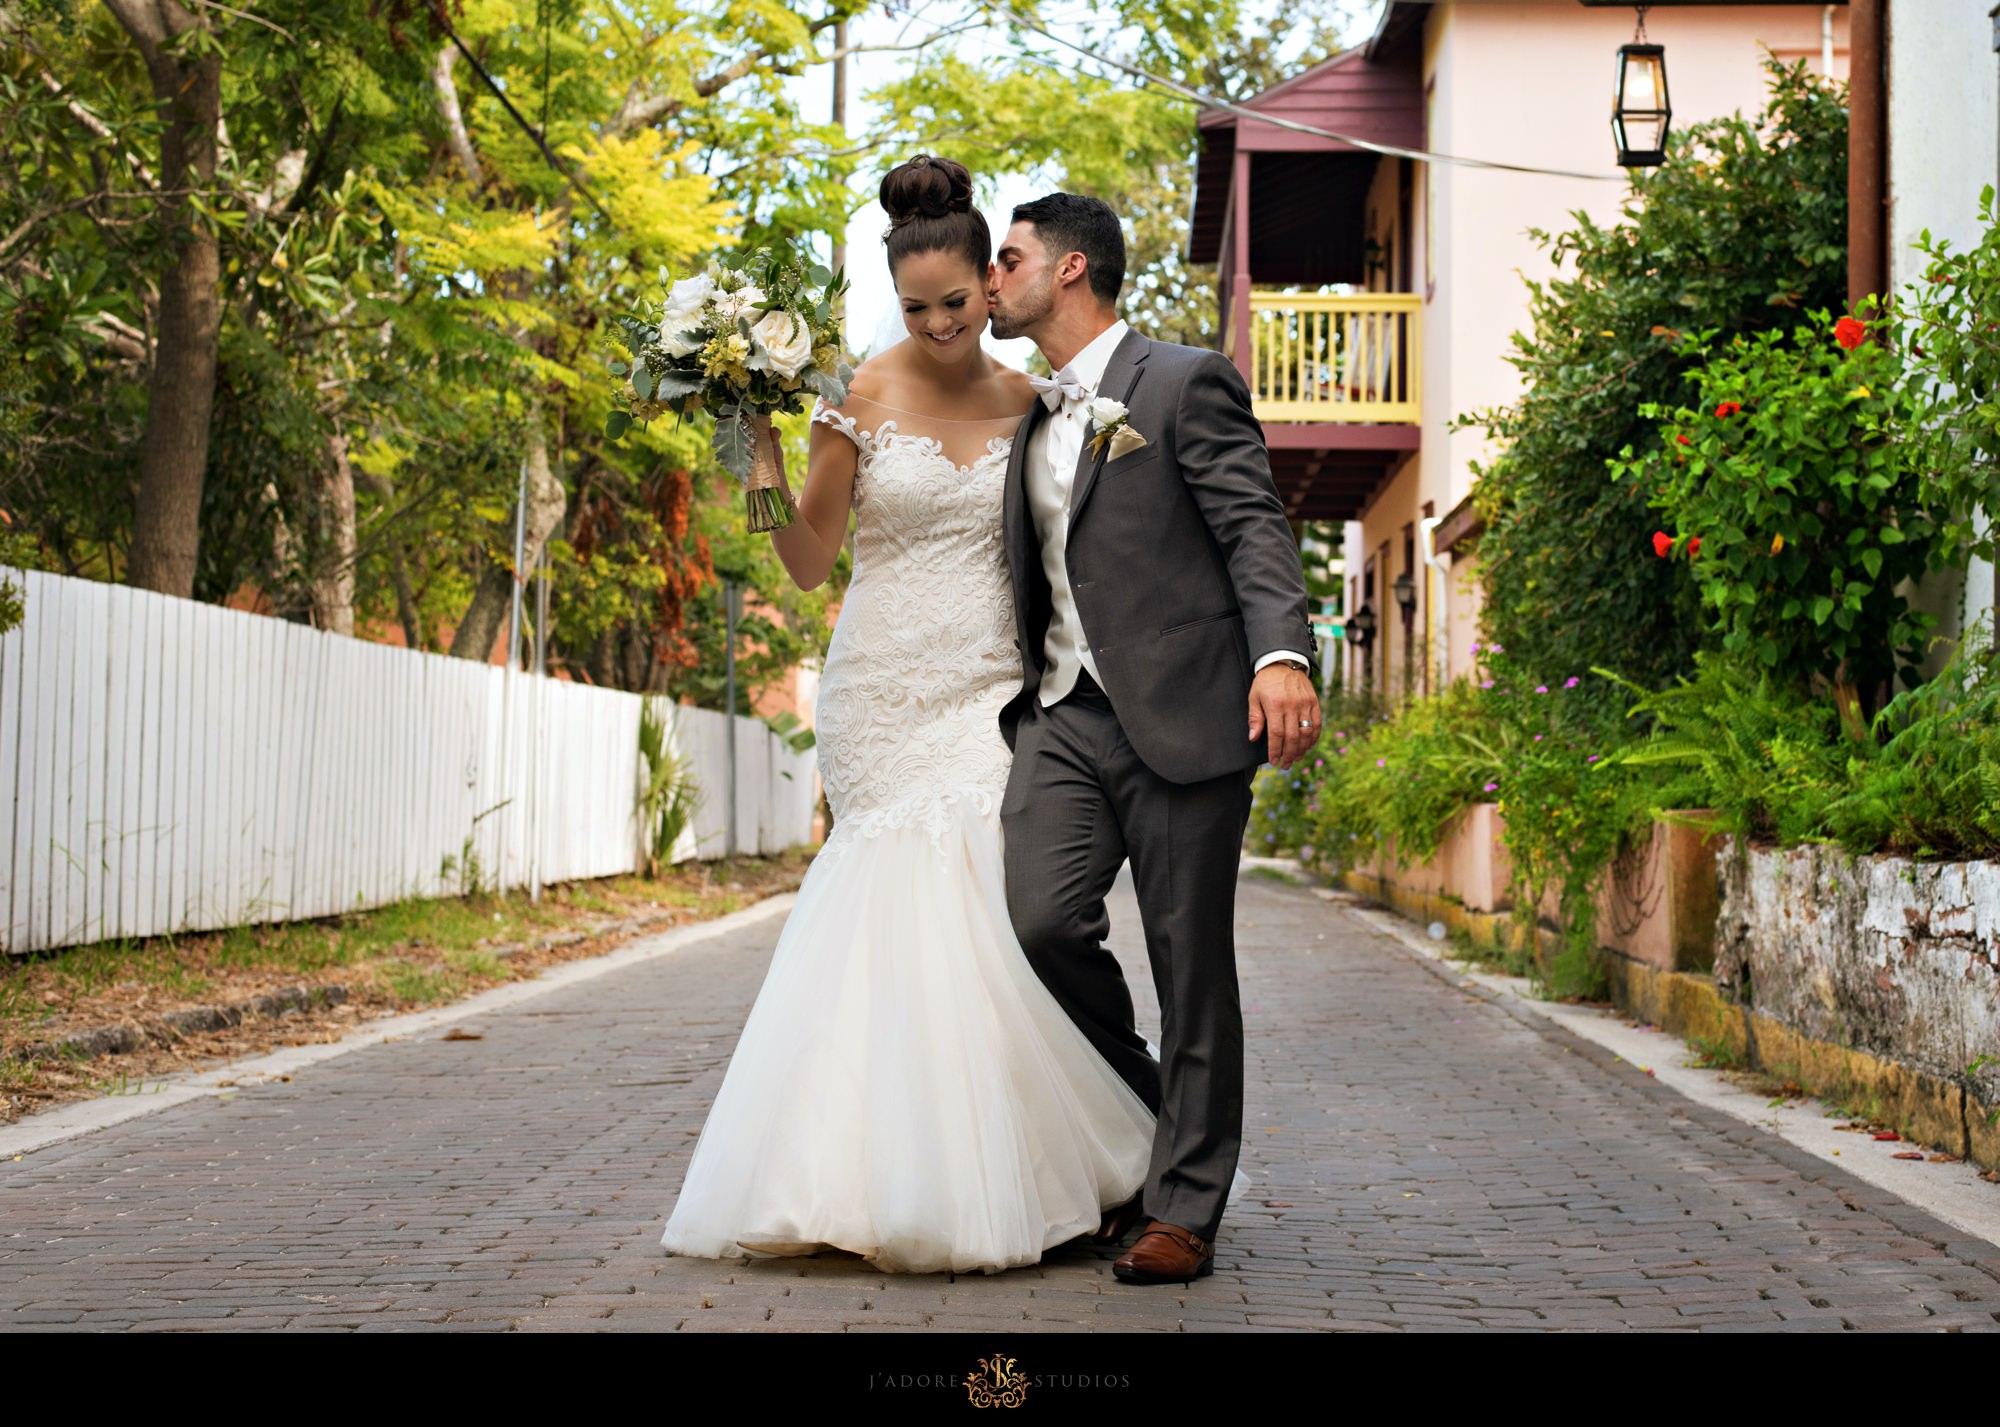 groom kisses bride on cheek walking on streets of Saint Augustine Florida